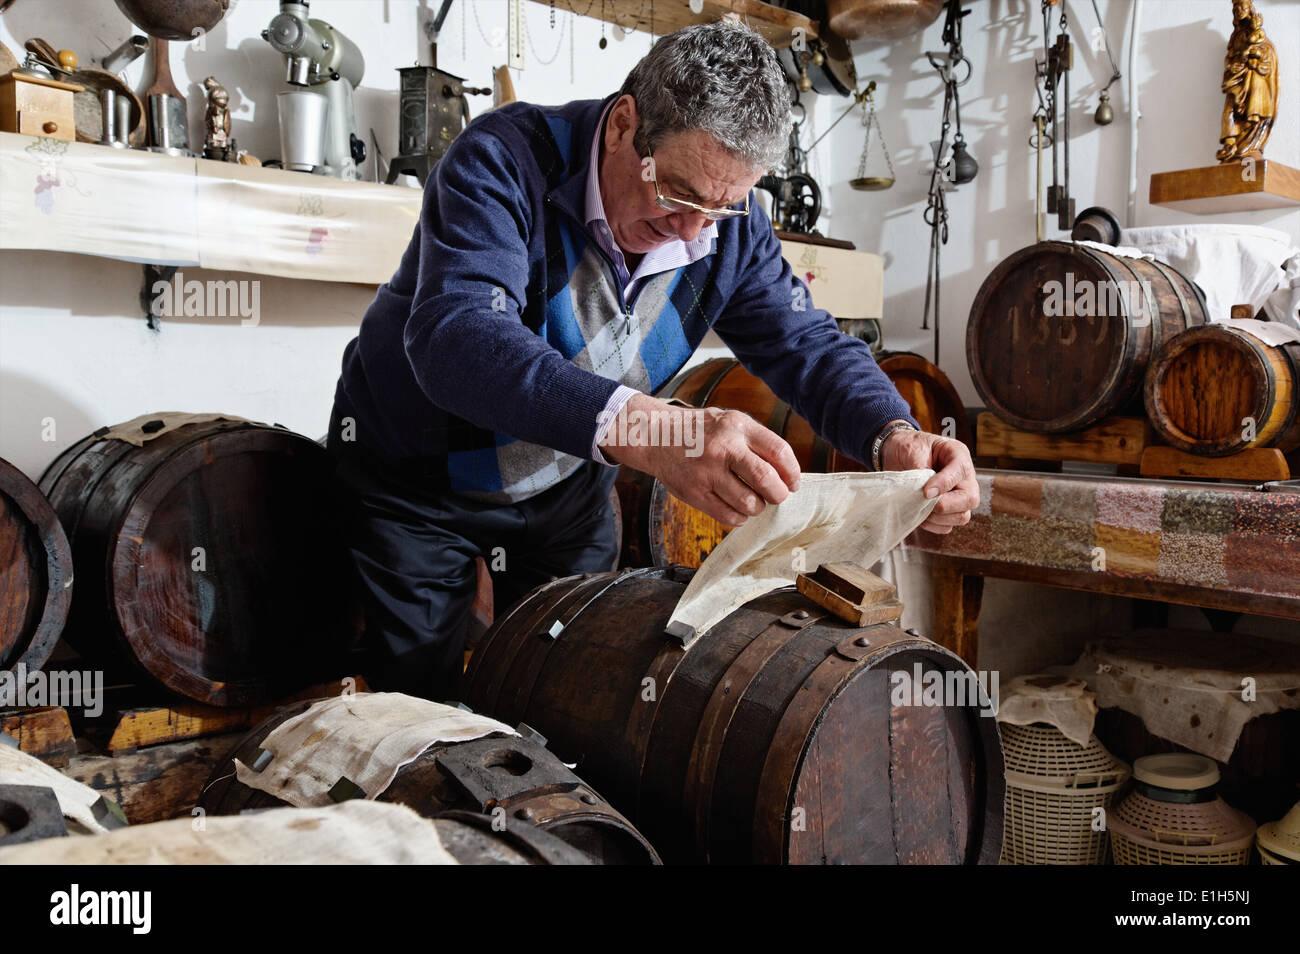 Man making and taking care over Aceto Balsamico Tradizionale di Modena - Stock Image